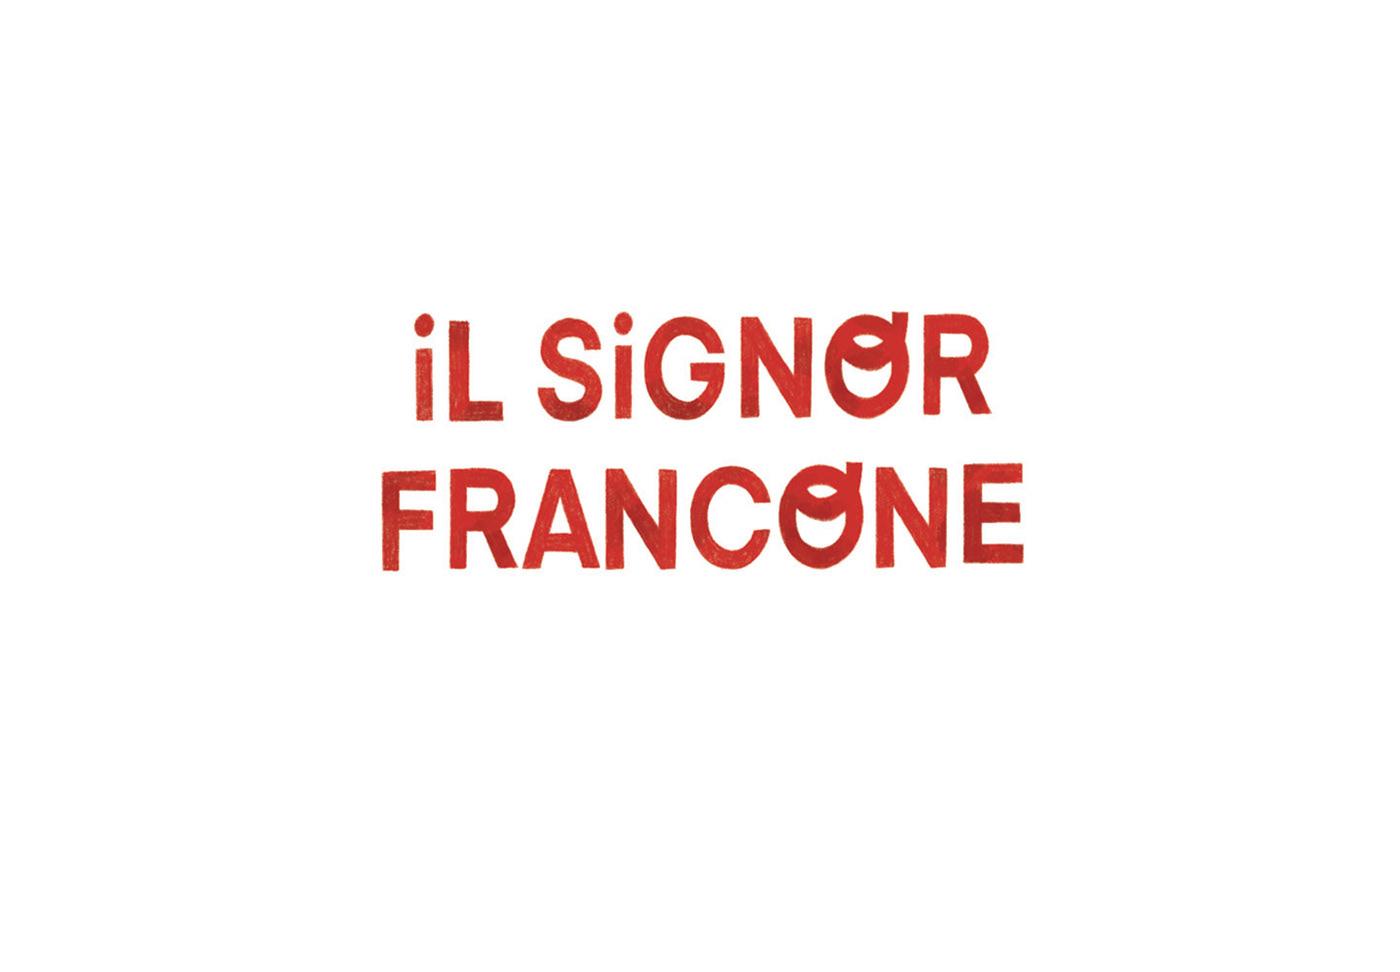 Studies based on the novel 'Il signor Francone' by Simona Toma.